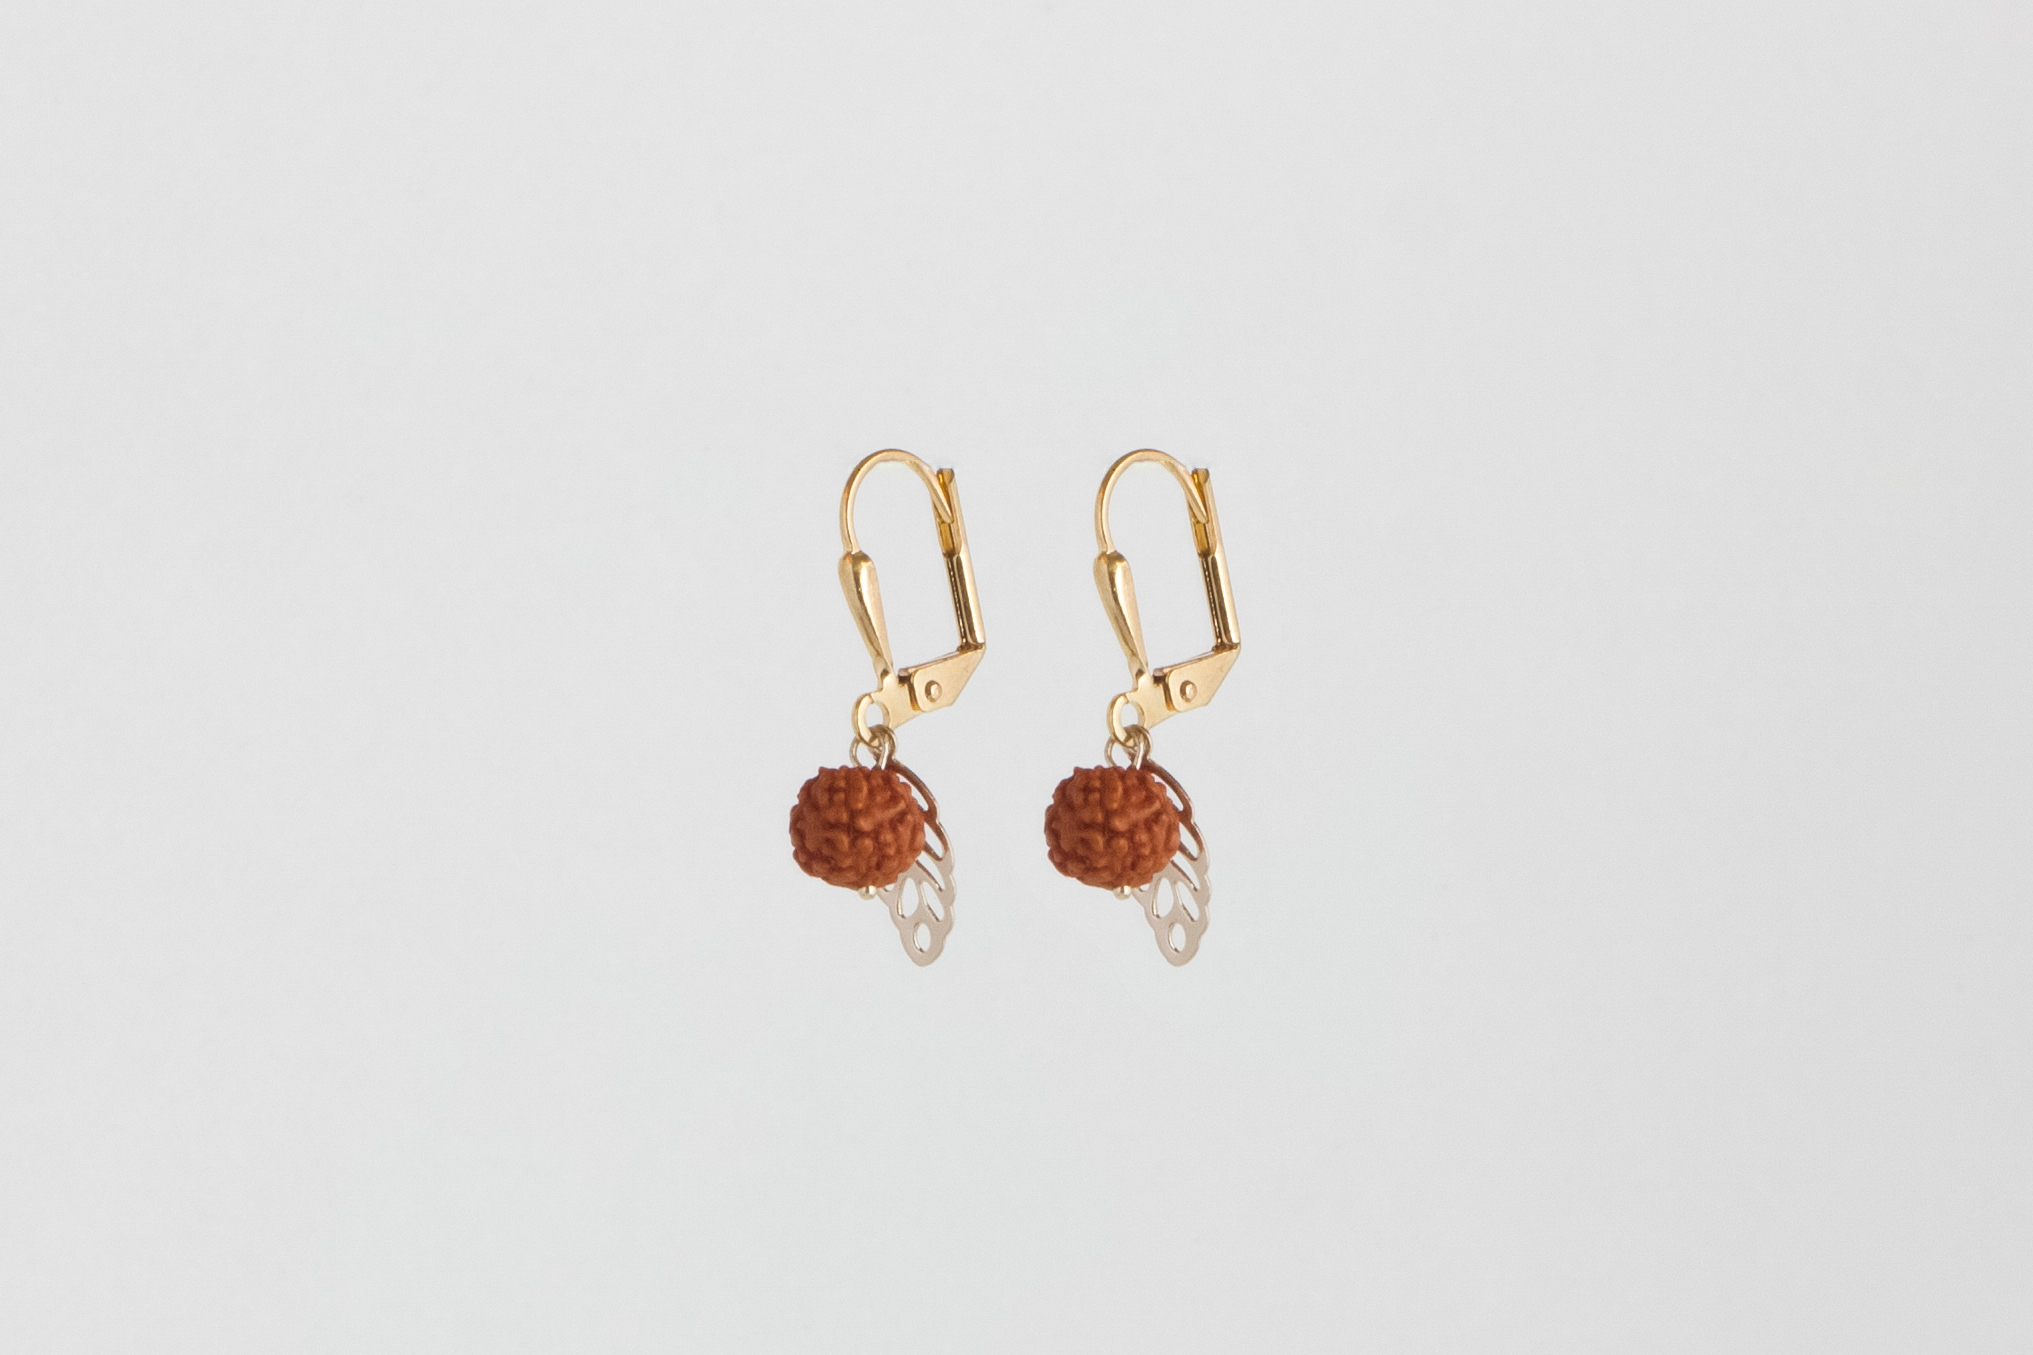 Julia Otilia-Rudraksha seed earrings, Gold plated,19.95 Euro